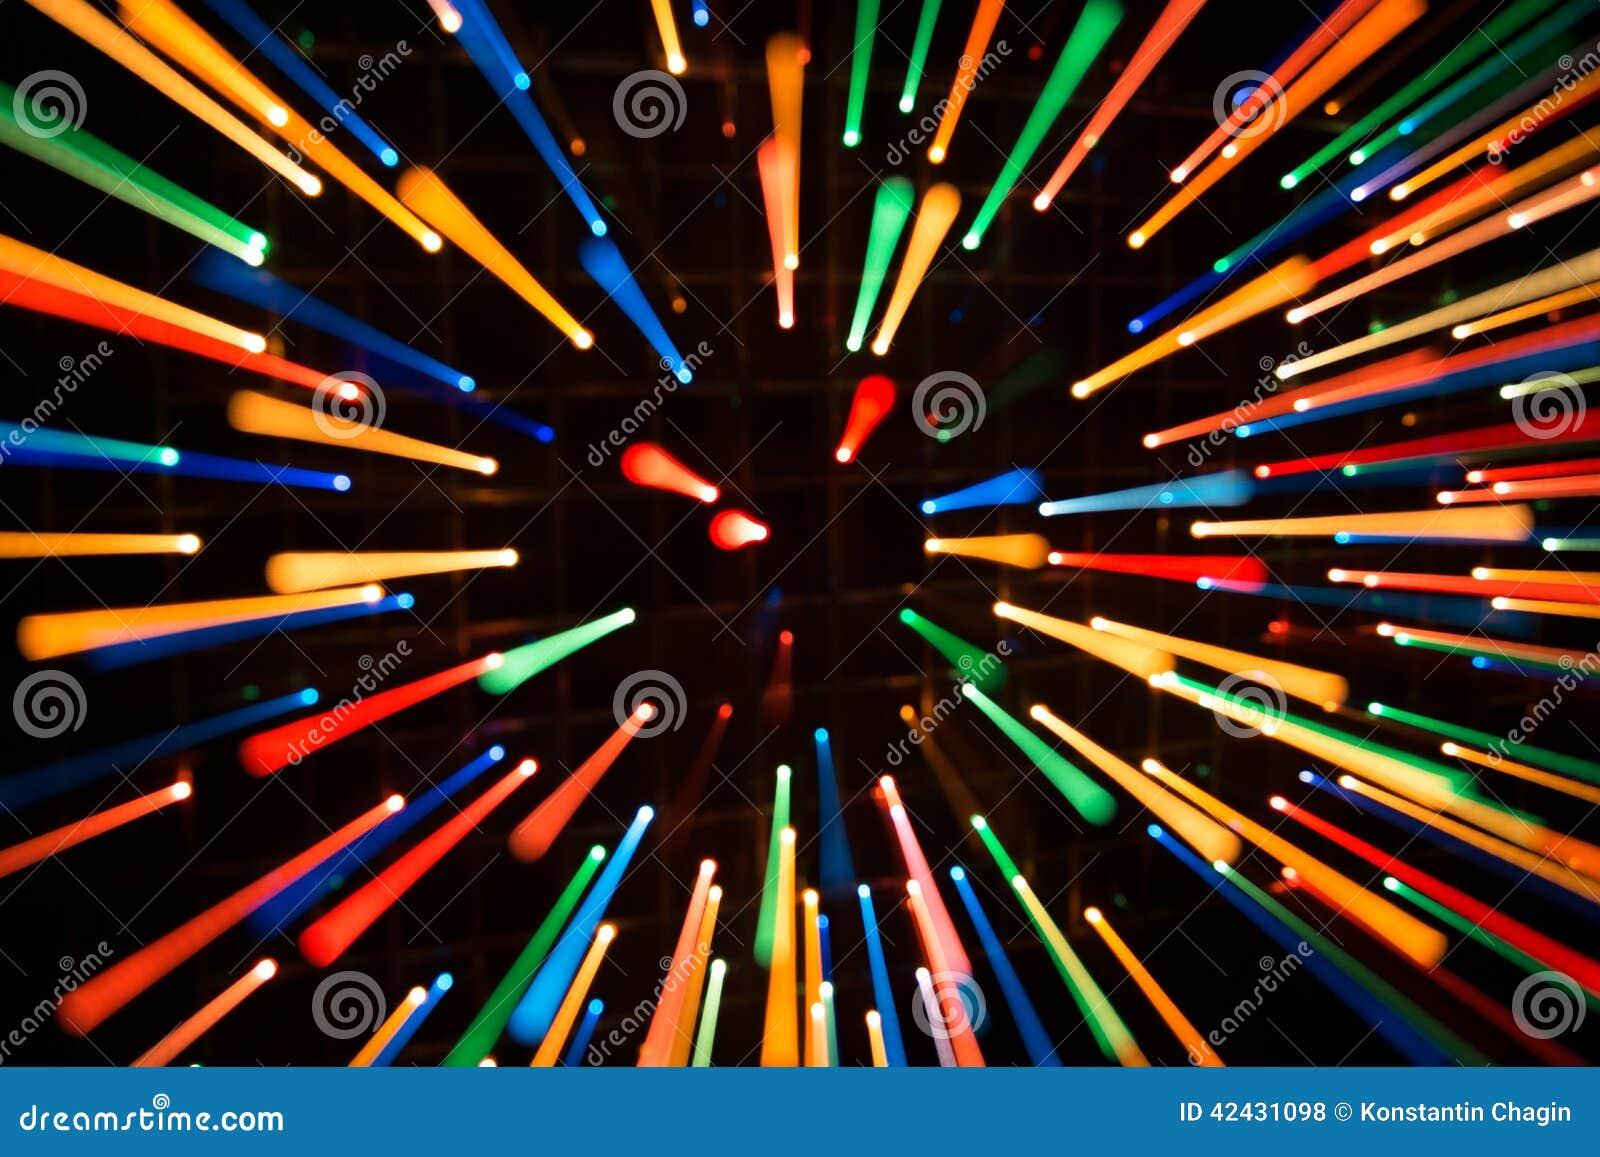 Fondo brillante de luces